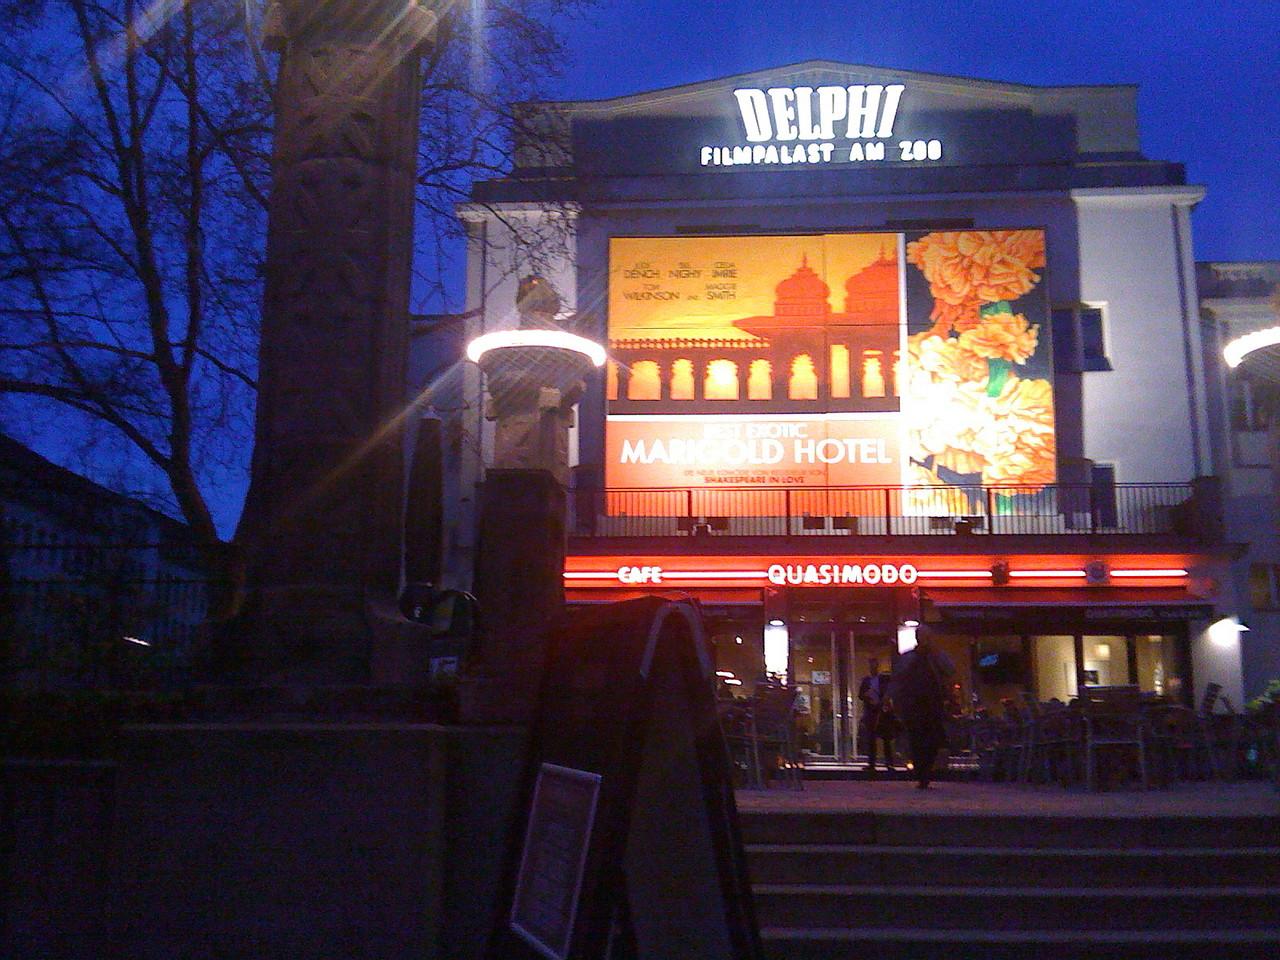 Der Delphi-Filmpalast